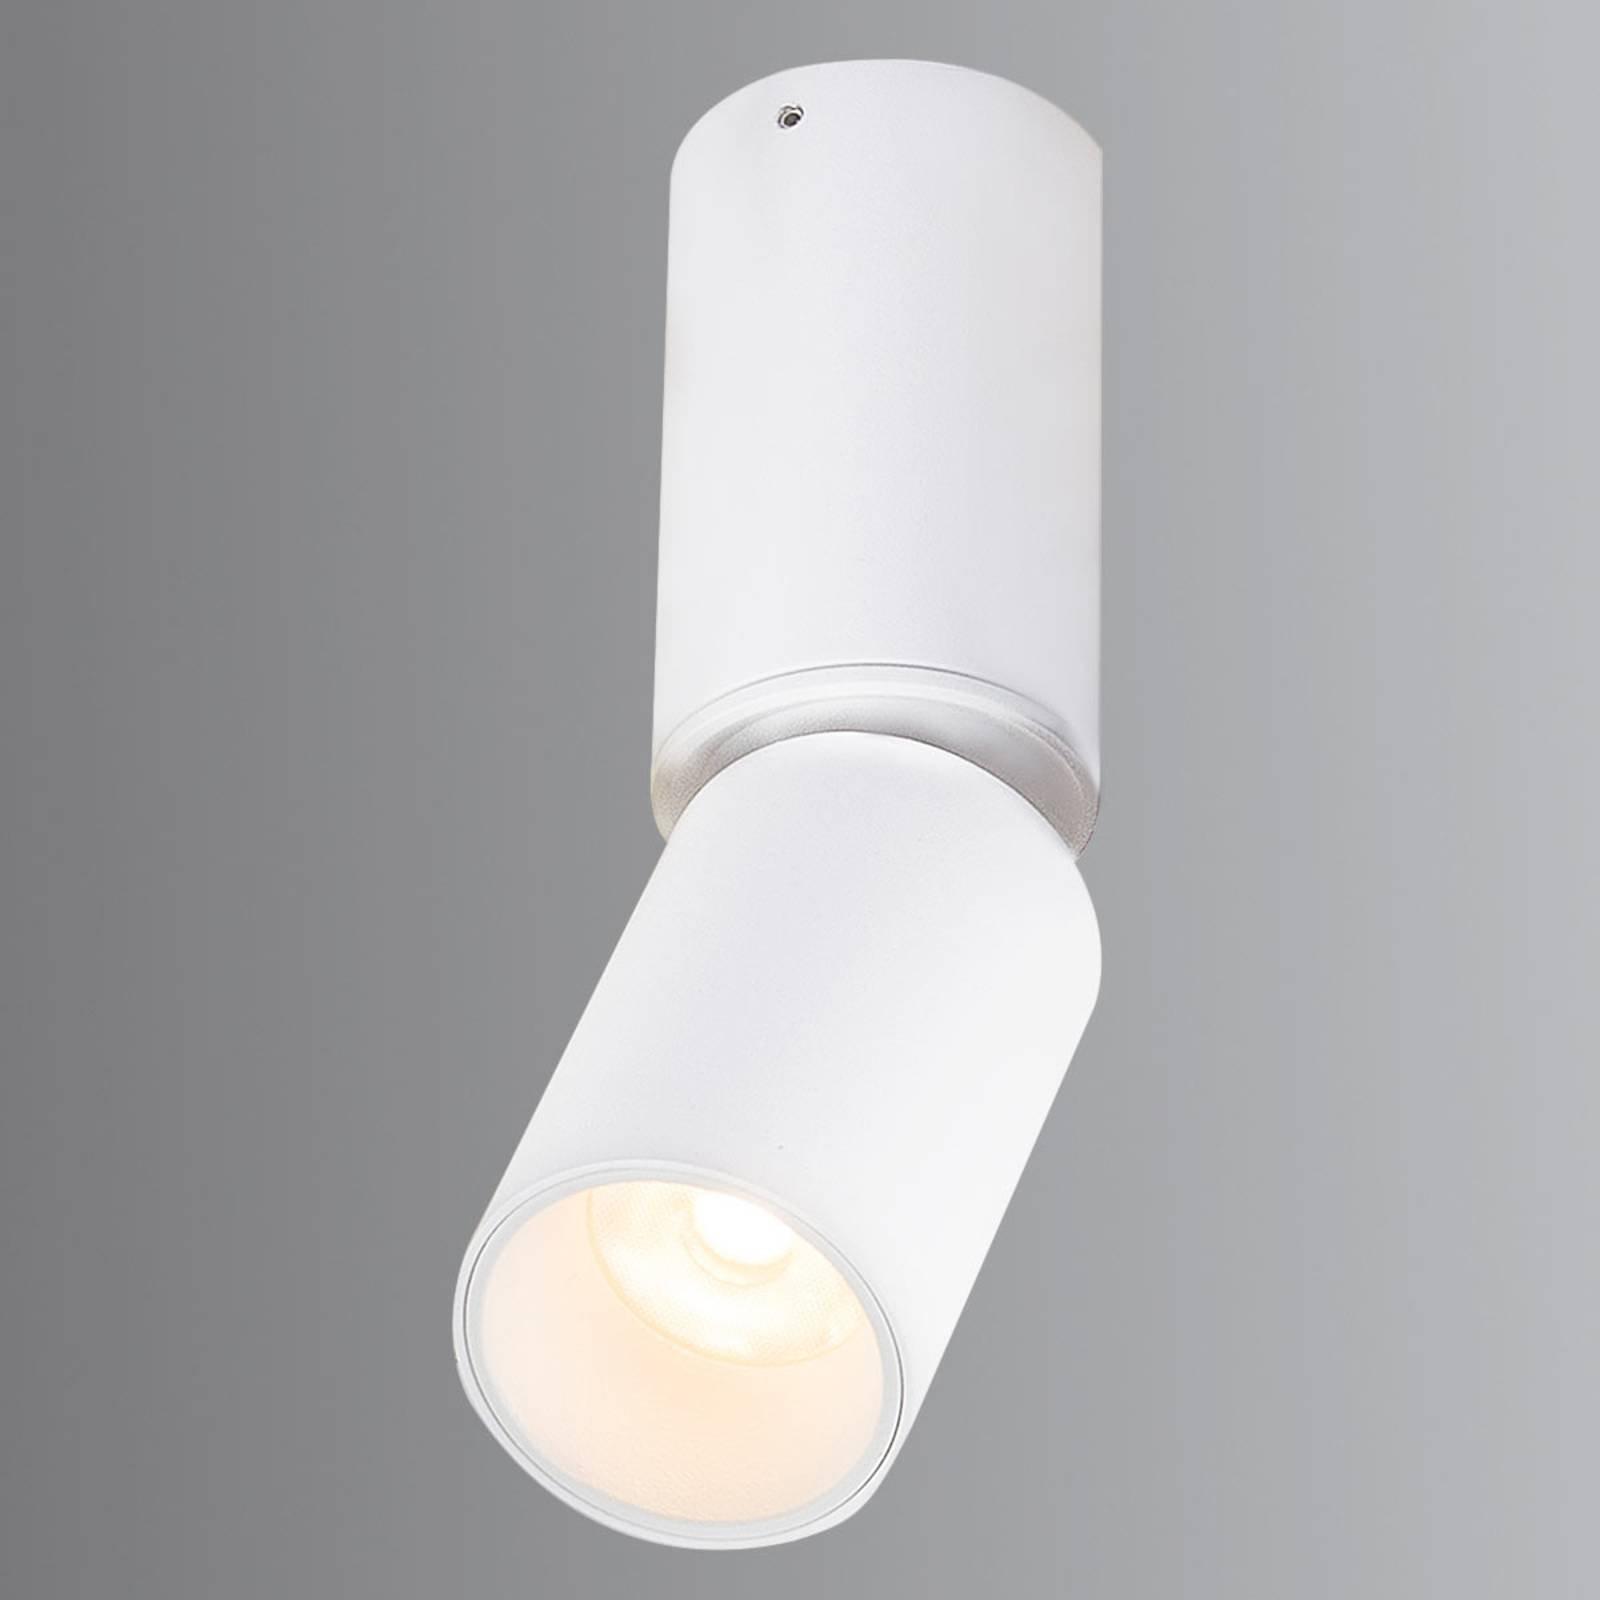 Bevegelig LED-takspot Luwin i aluminium